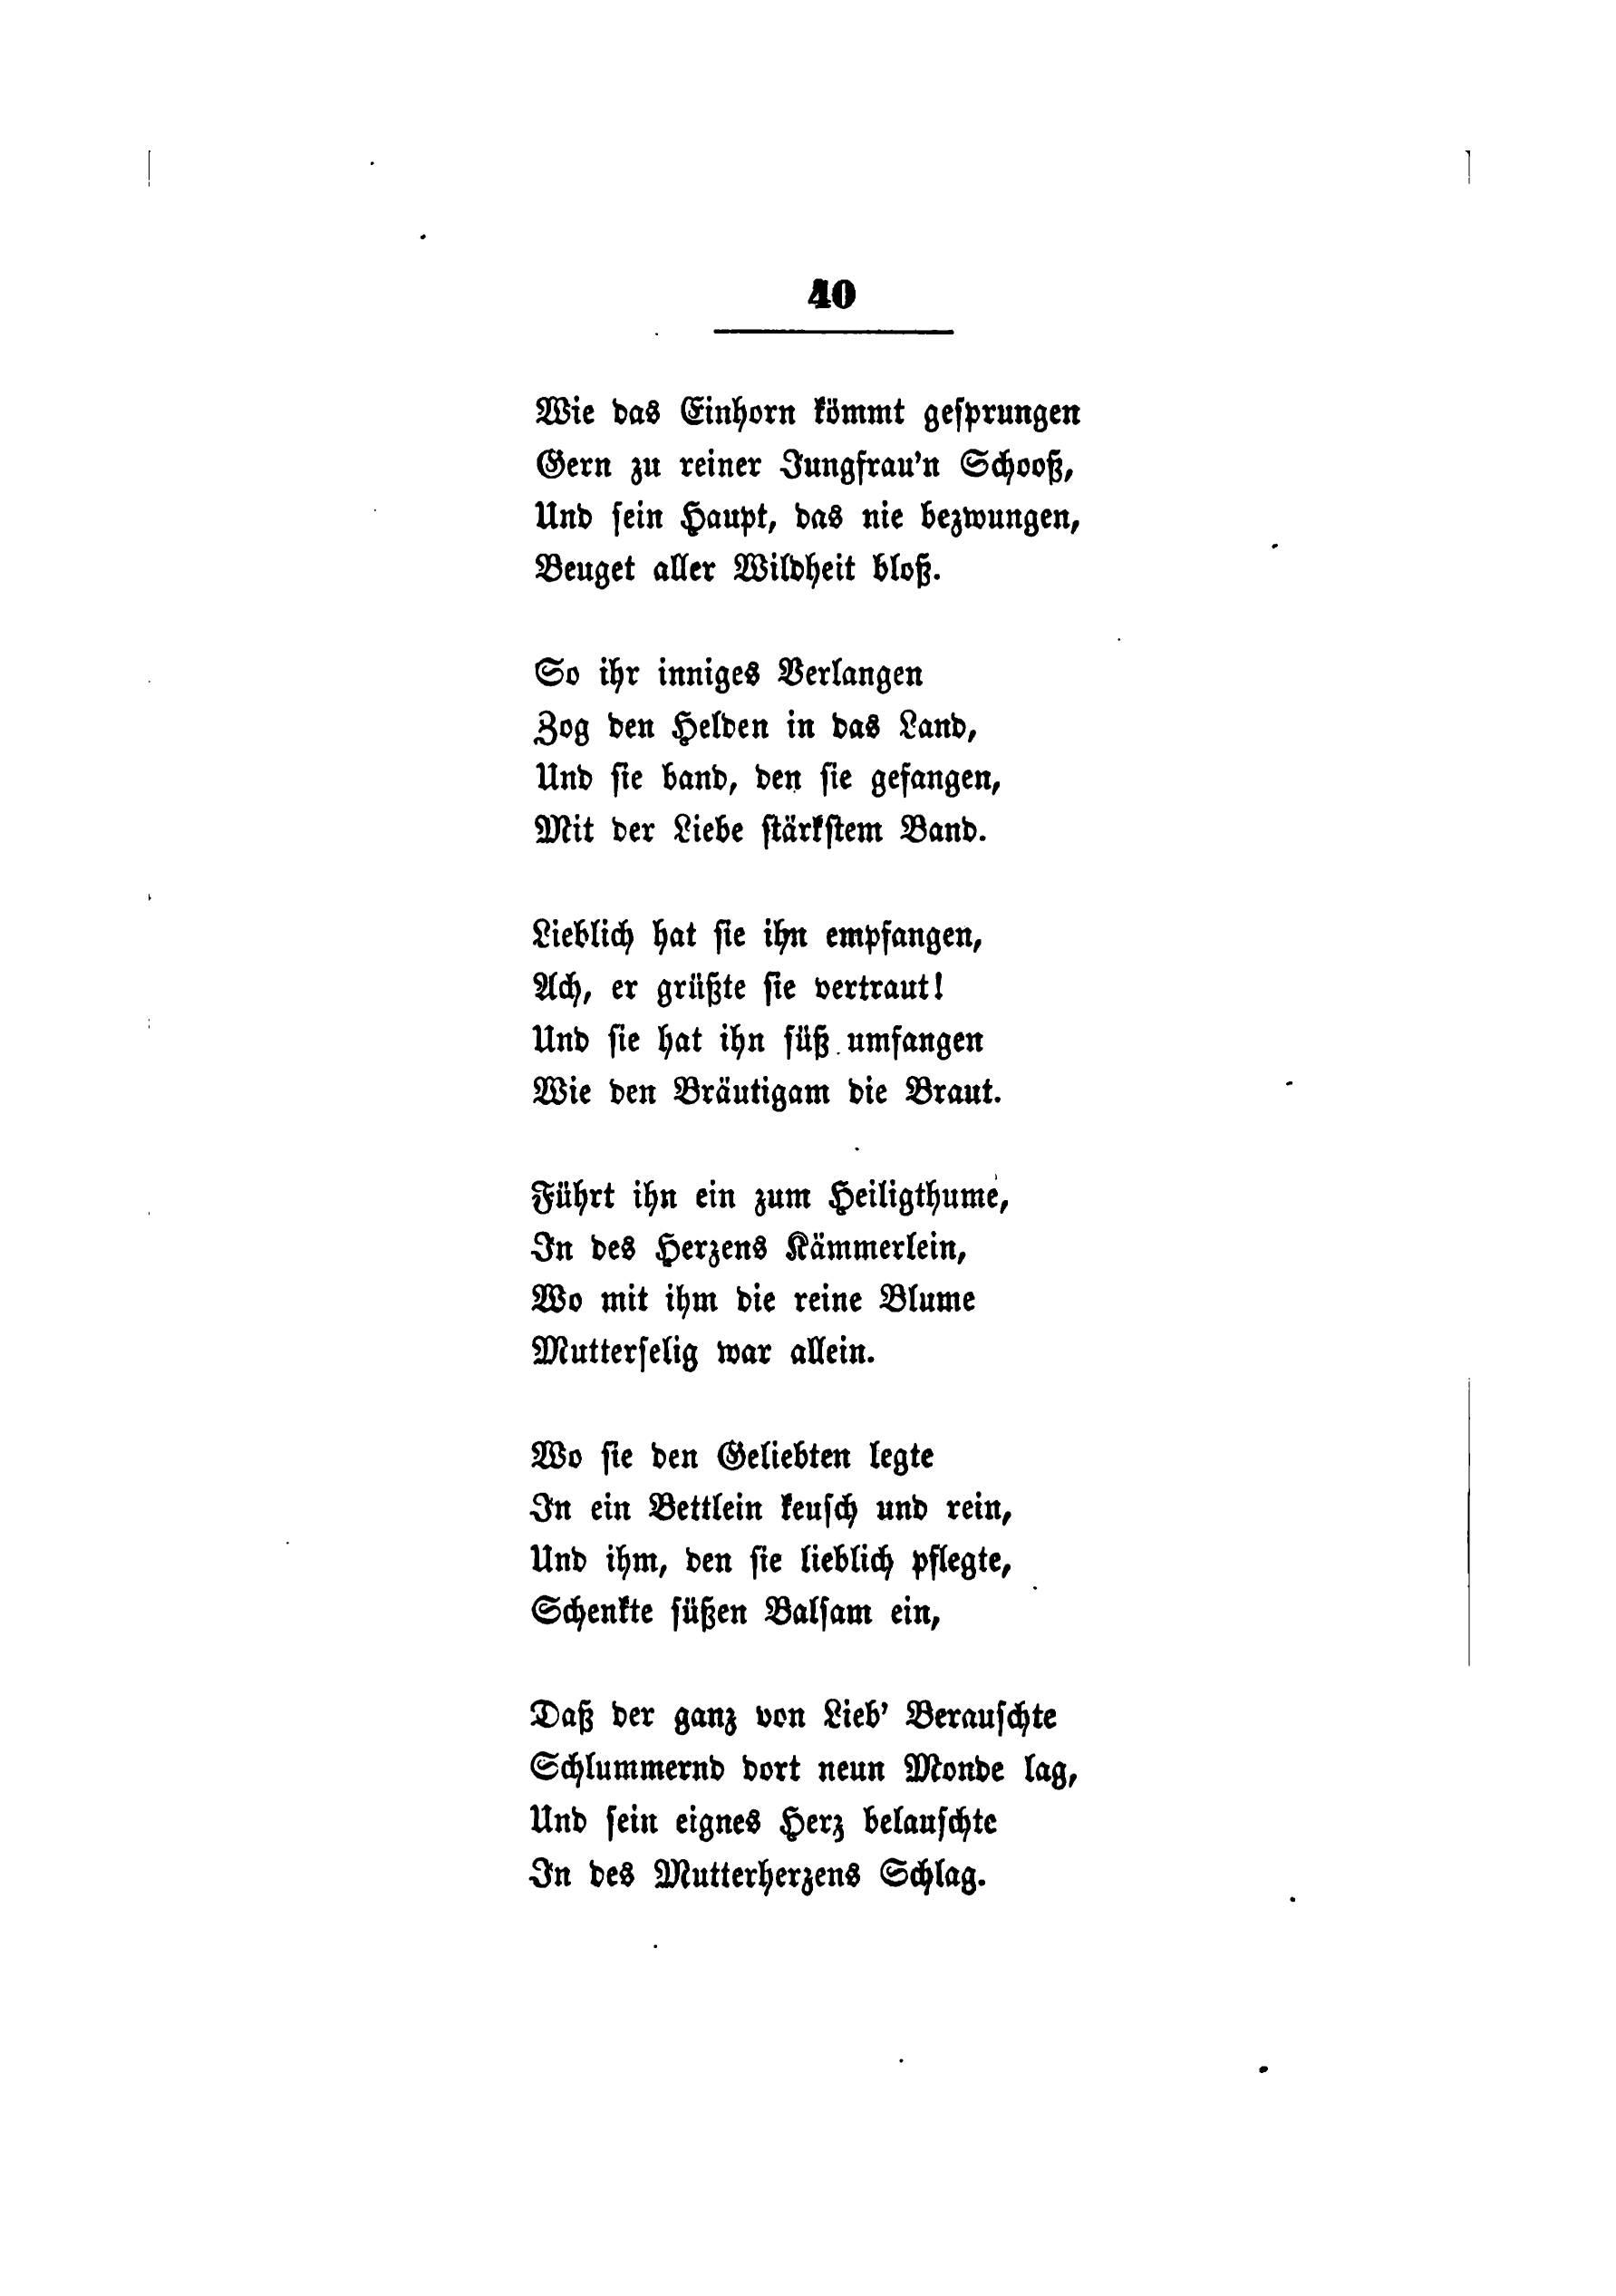 File Clemens Brentano S Gesammelte Schriften I 040 Wikimedia